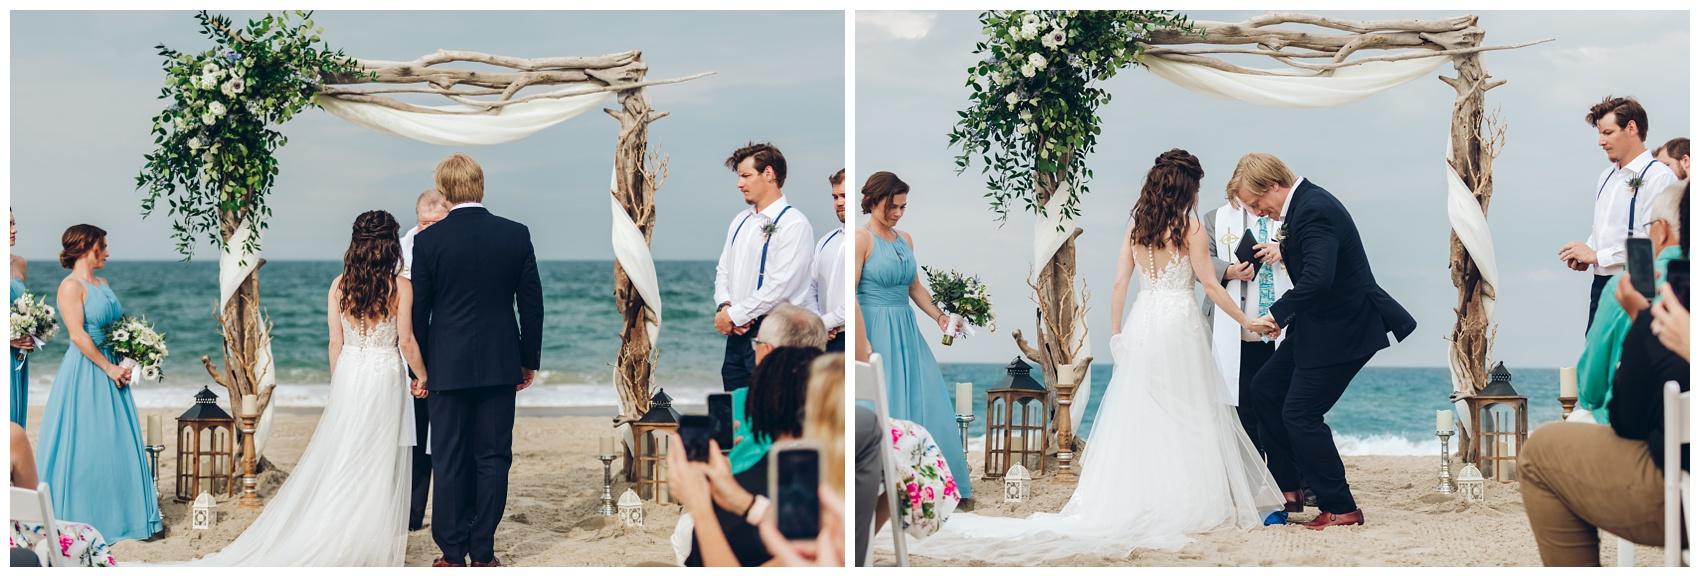 Outer-Banks-Corolla-Wedding_0065.jpg